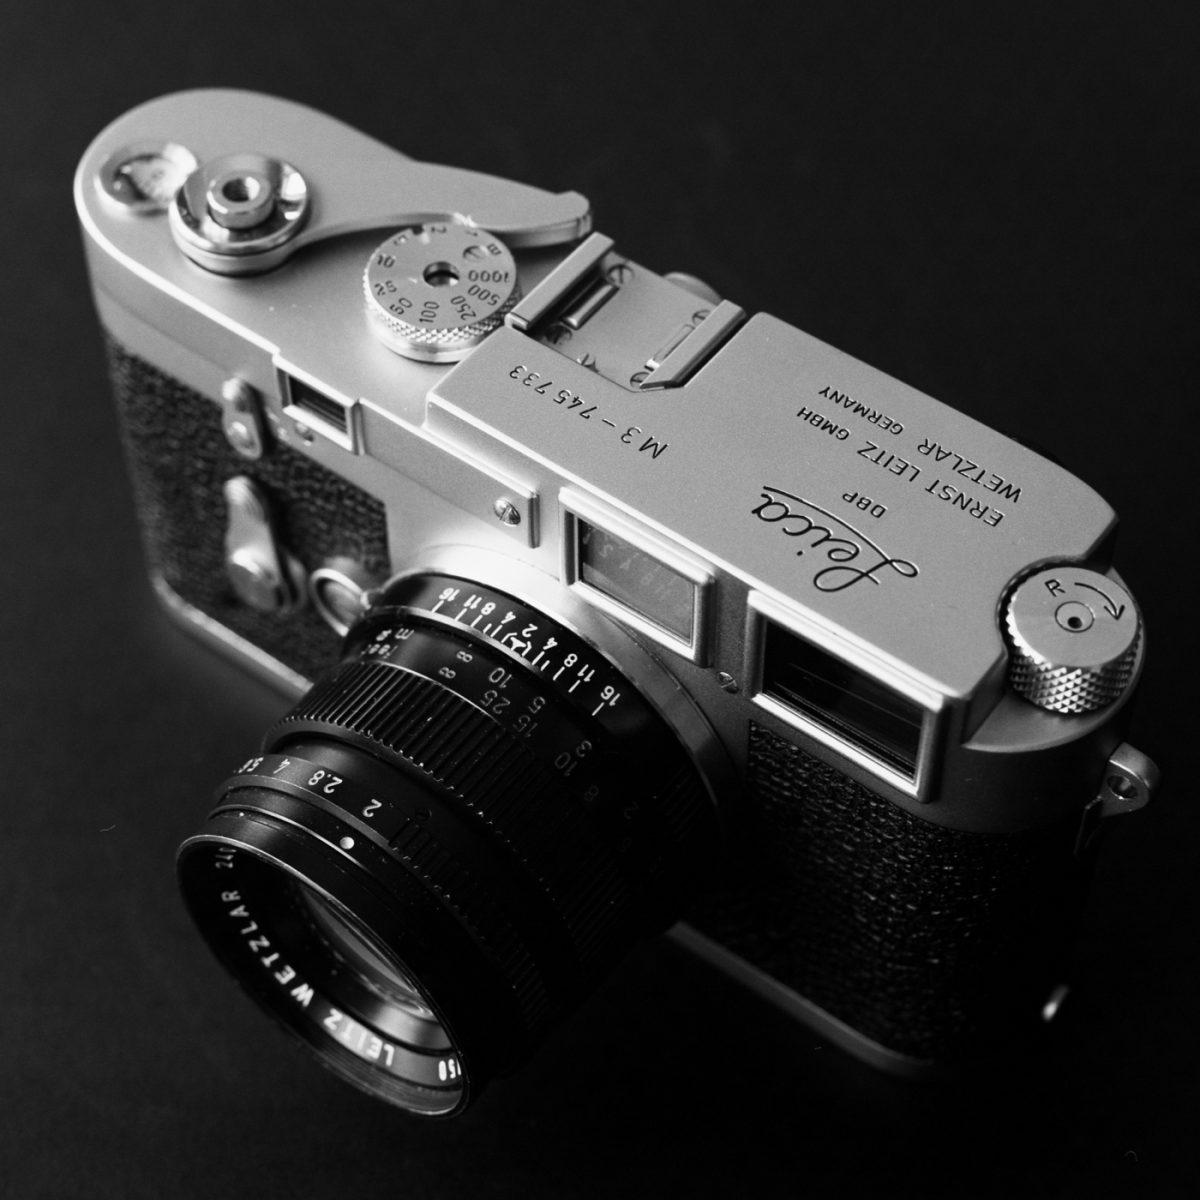 Photographic film - Camera lens